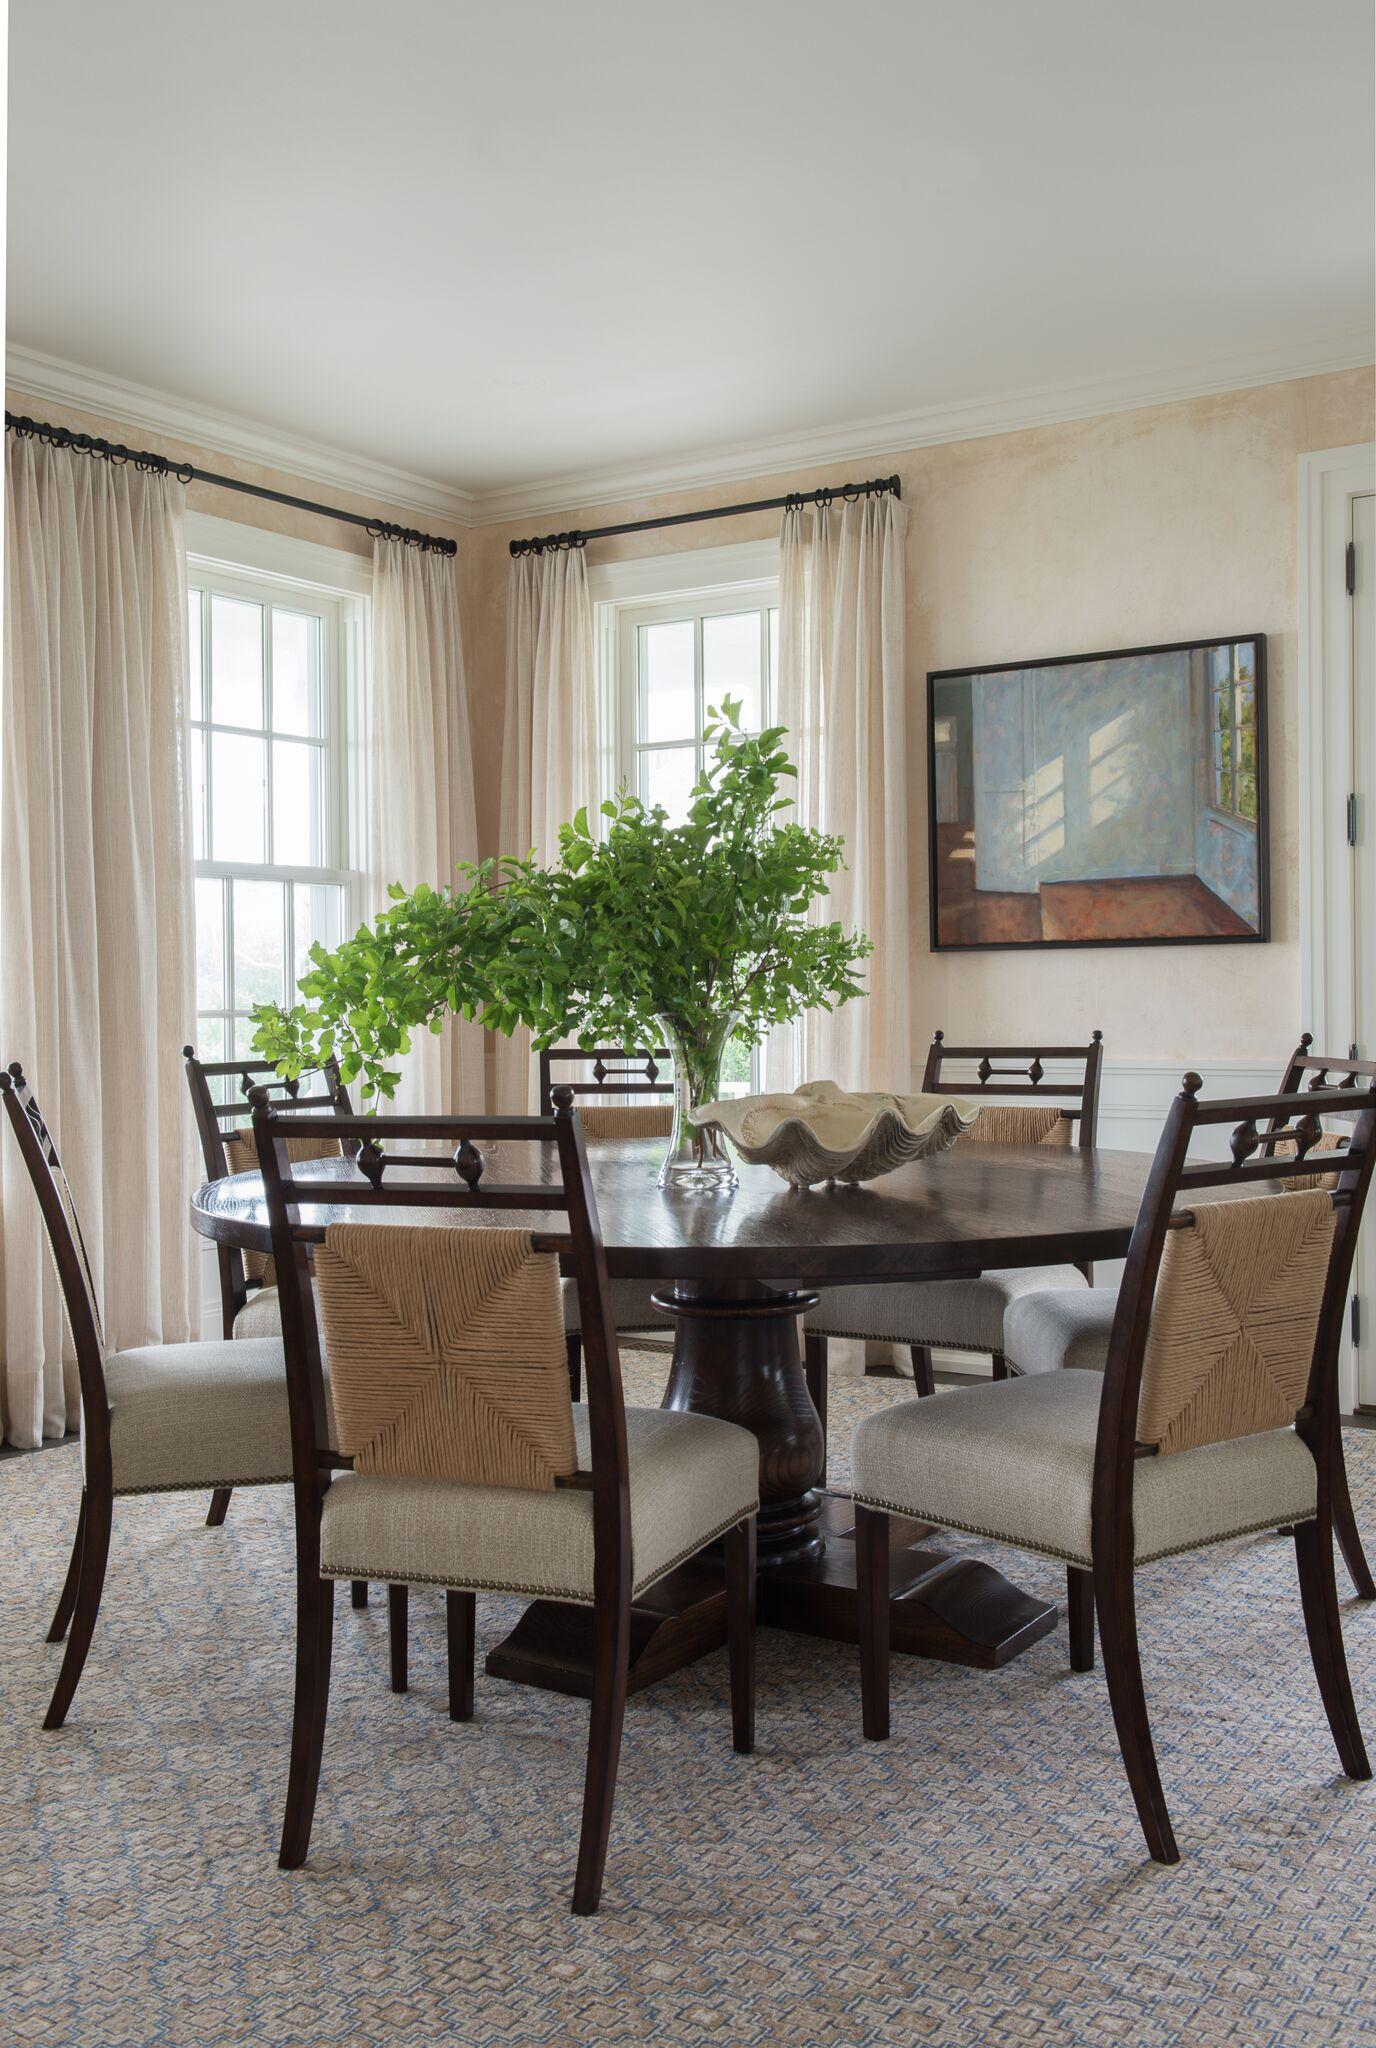 5. LOWER THE ARTWORK •  Interiors: Nantucket House Antiques and Interior Design Studios, Inc.